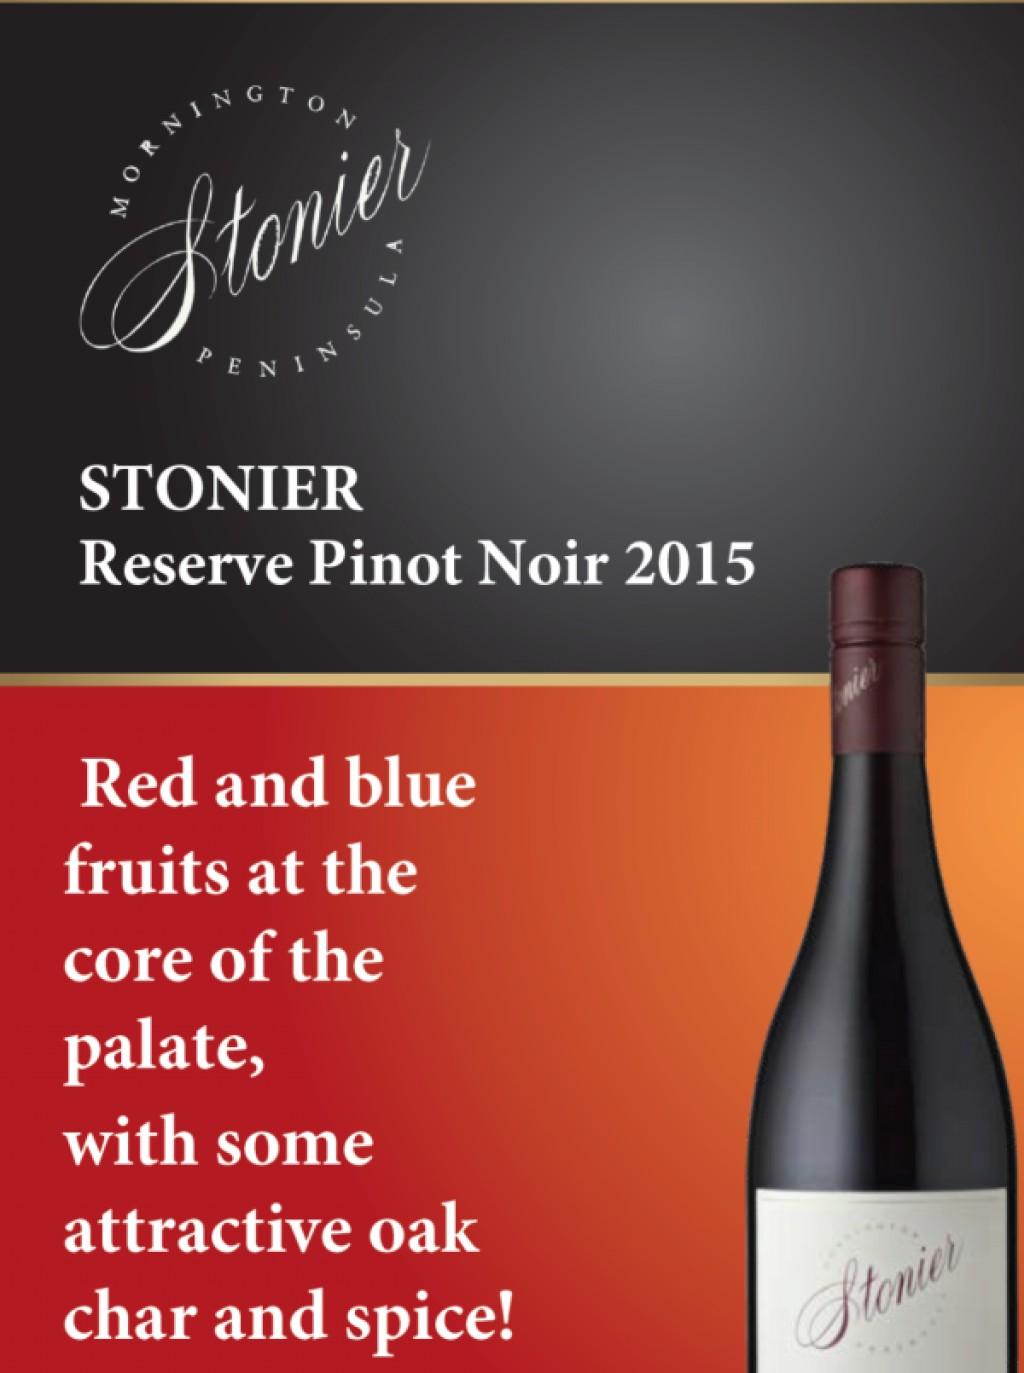 Stonier Reserve Pinot Noir 2015